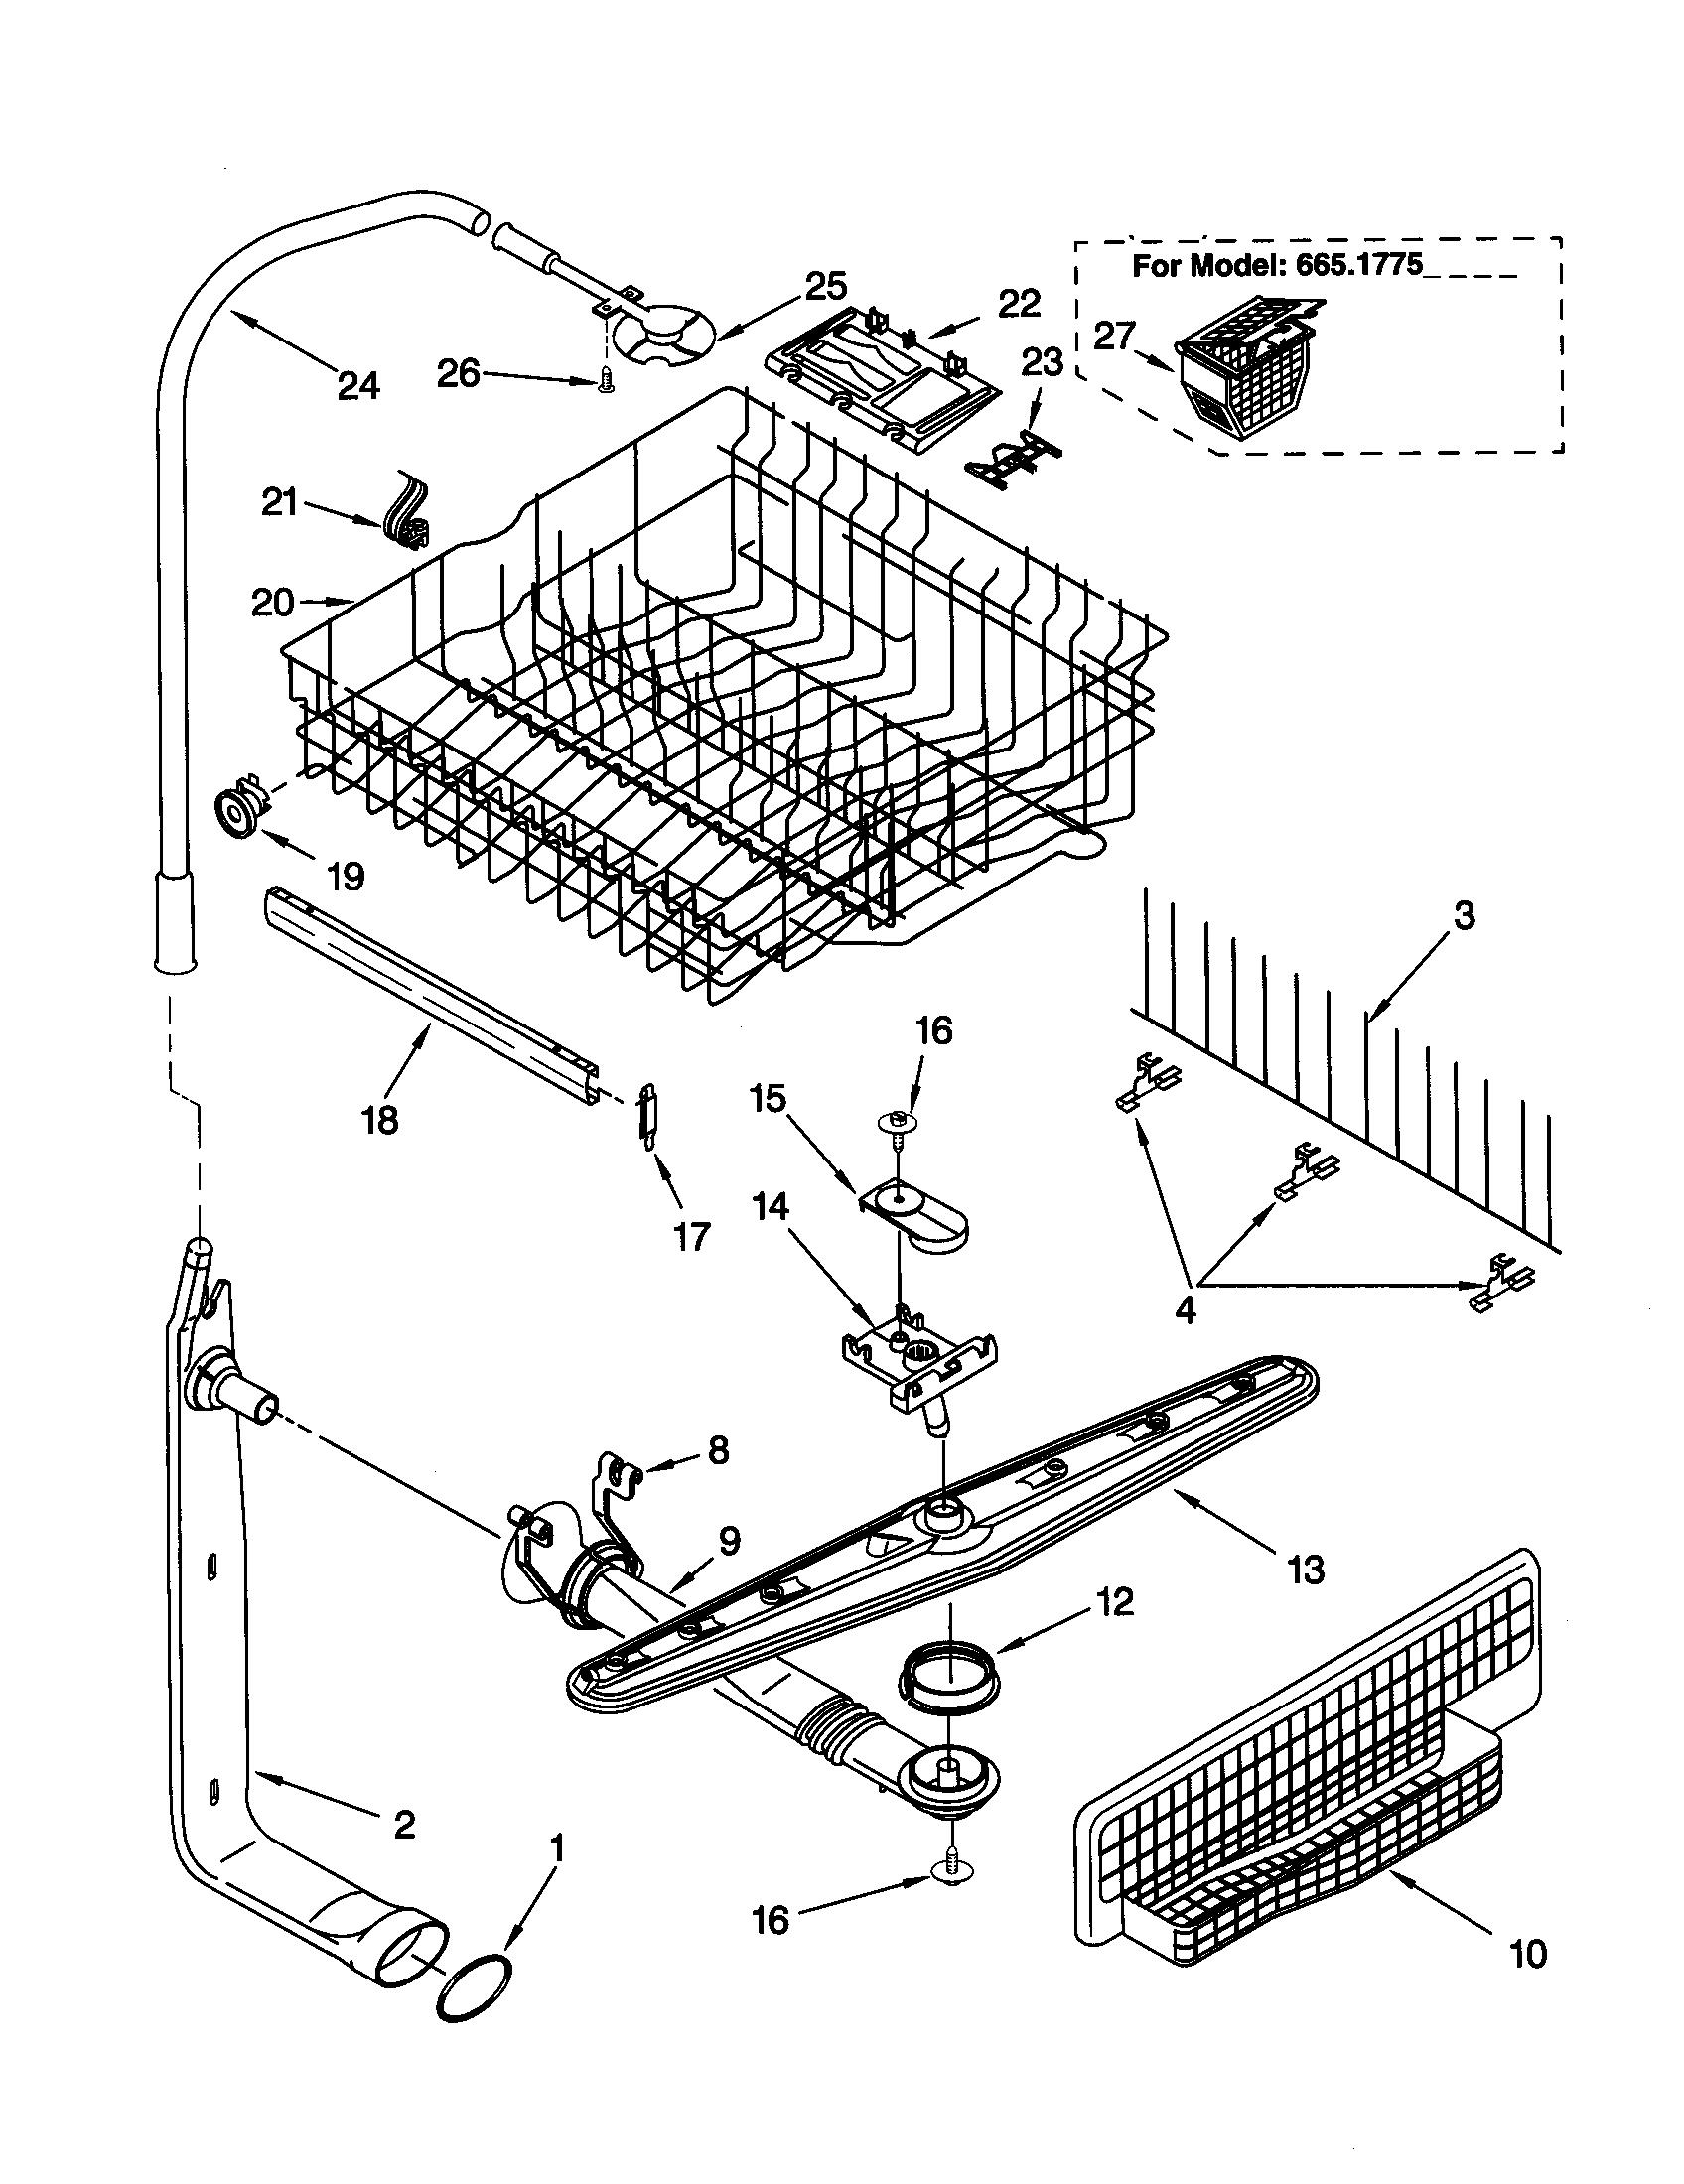 Kenmore Dishwasher Manuals | Guidessimo.com